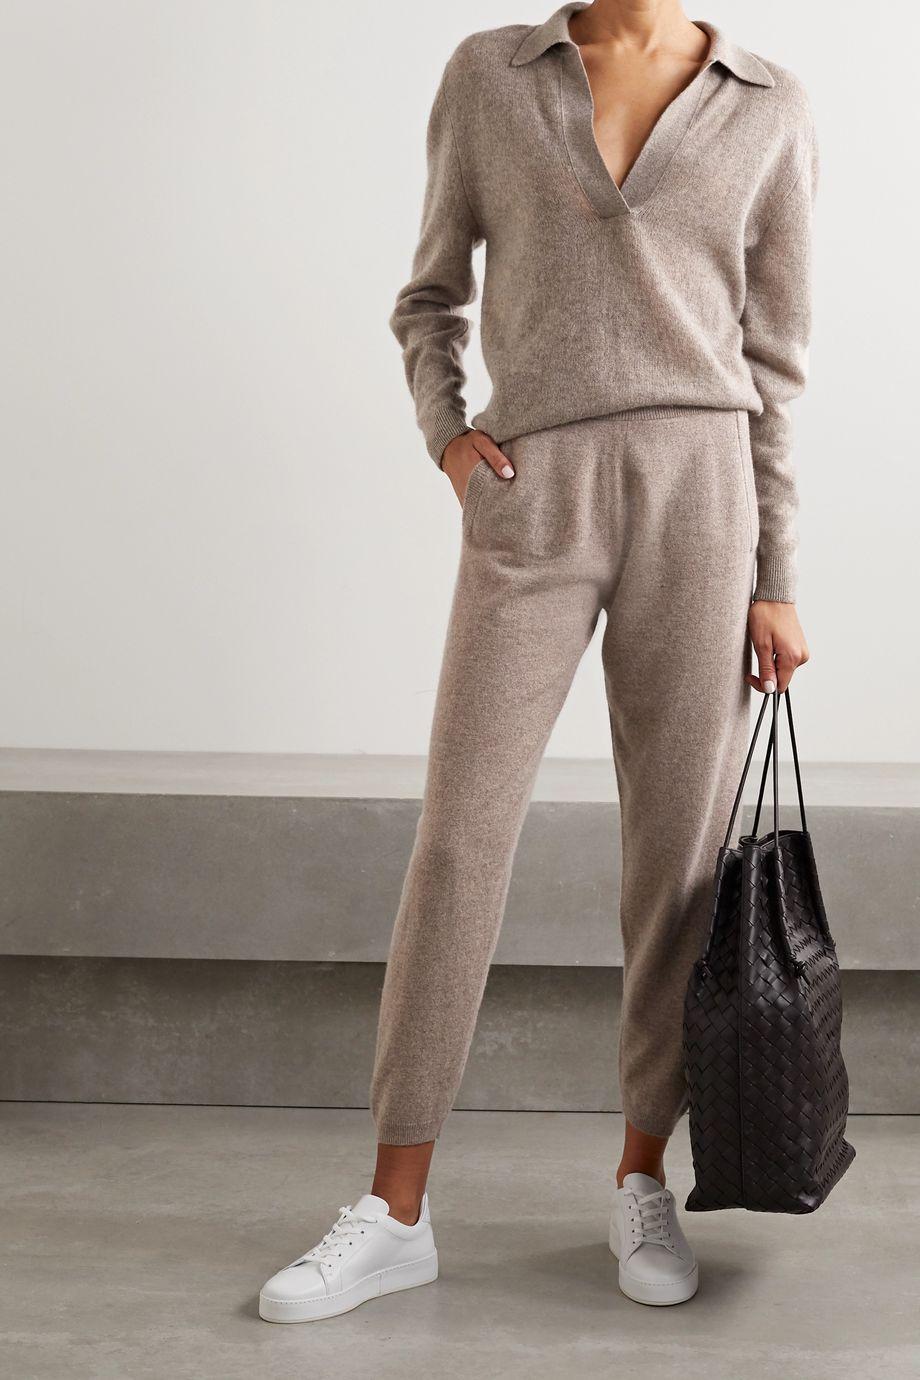 Max Mara Leisure Pernice cashmere track pants